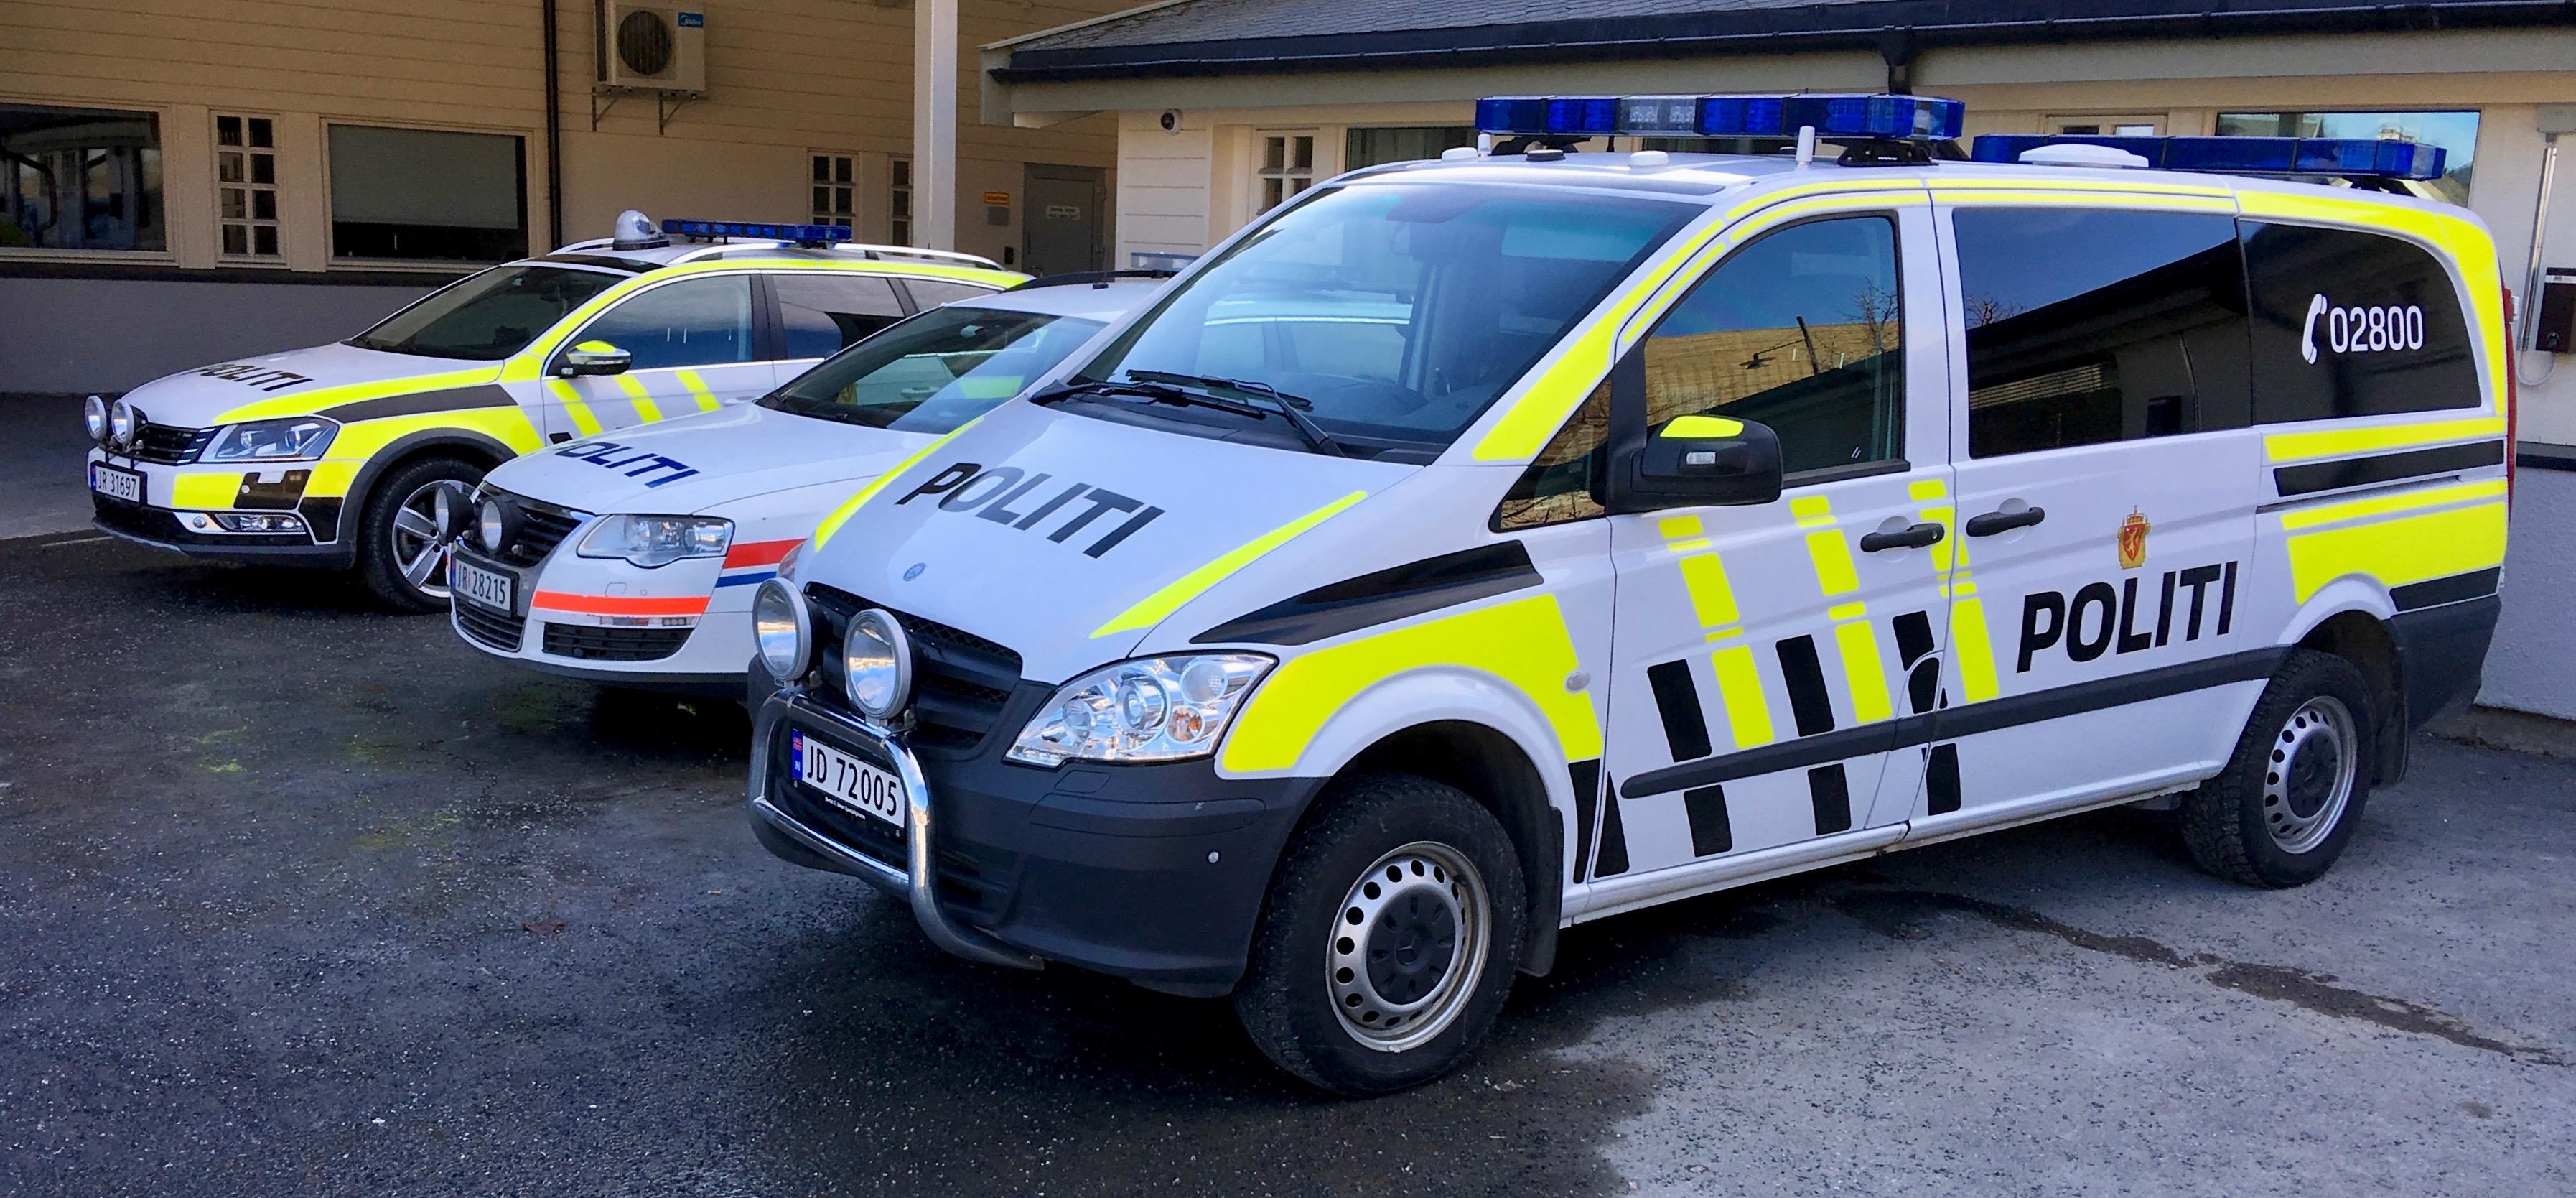 Nord aurdal drøbak www realescorte massasje i kristiansand massasje bærum norway dating